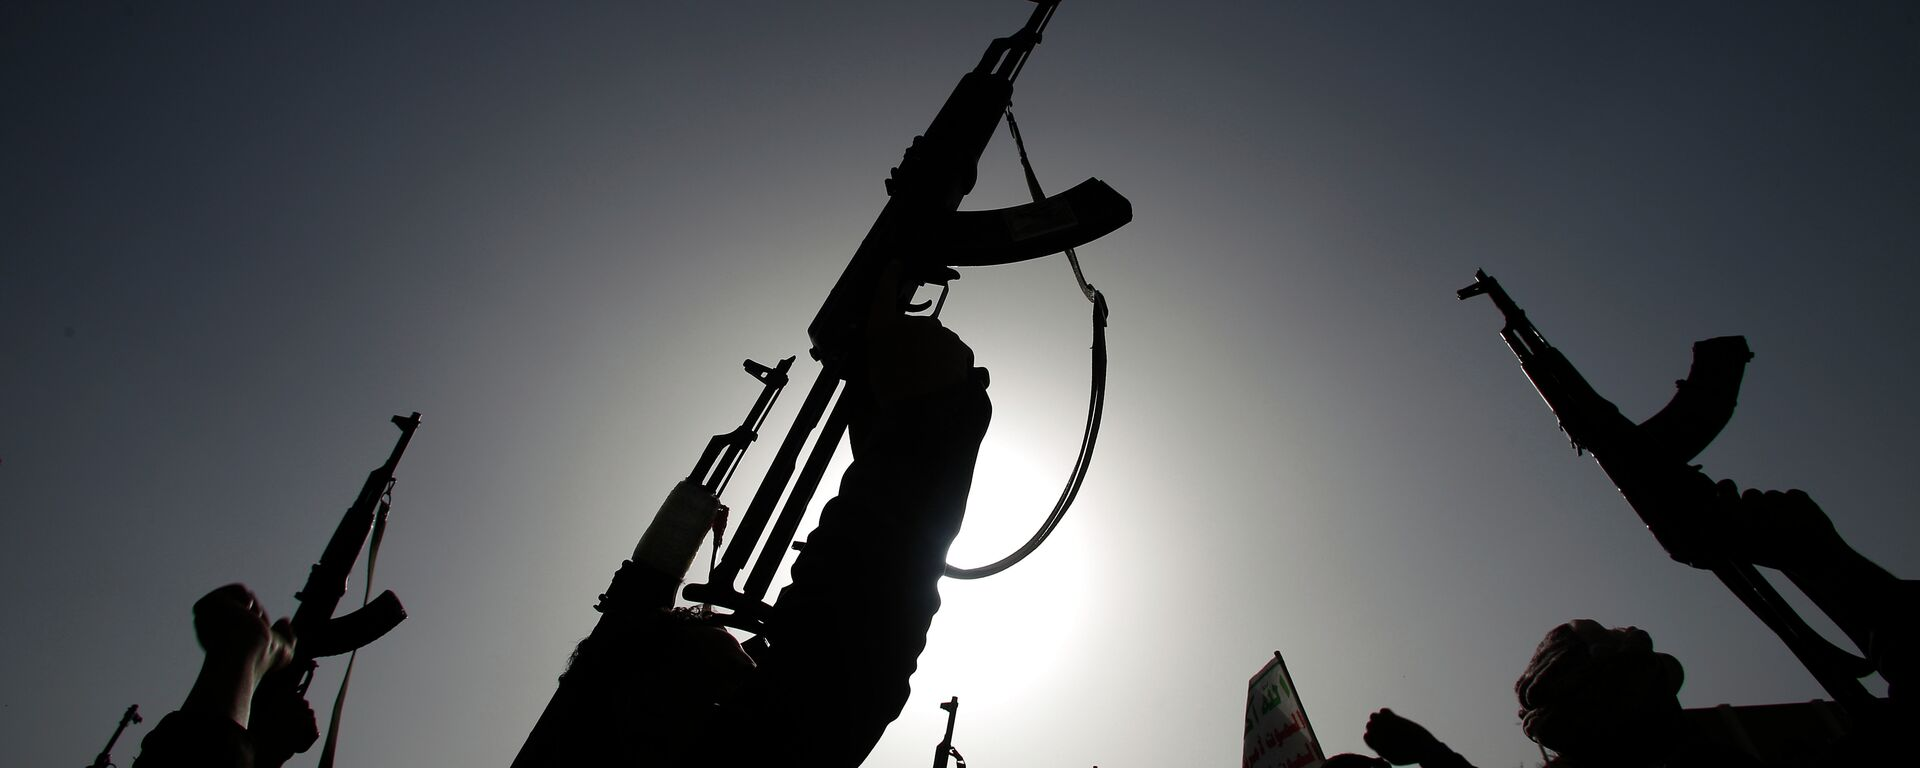 Ribelli sciiti conosciuti come Houthi, Yemen - Sputnik Italia, 1920, 06.04.2021